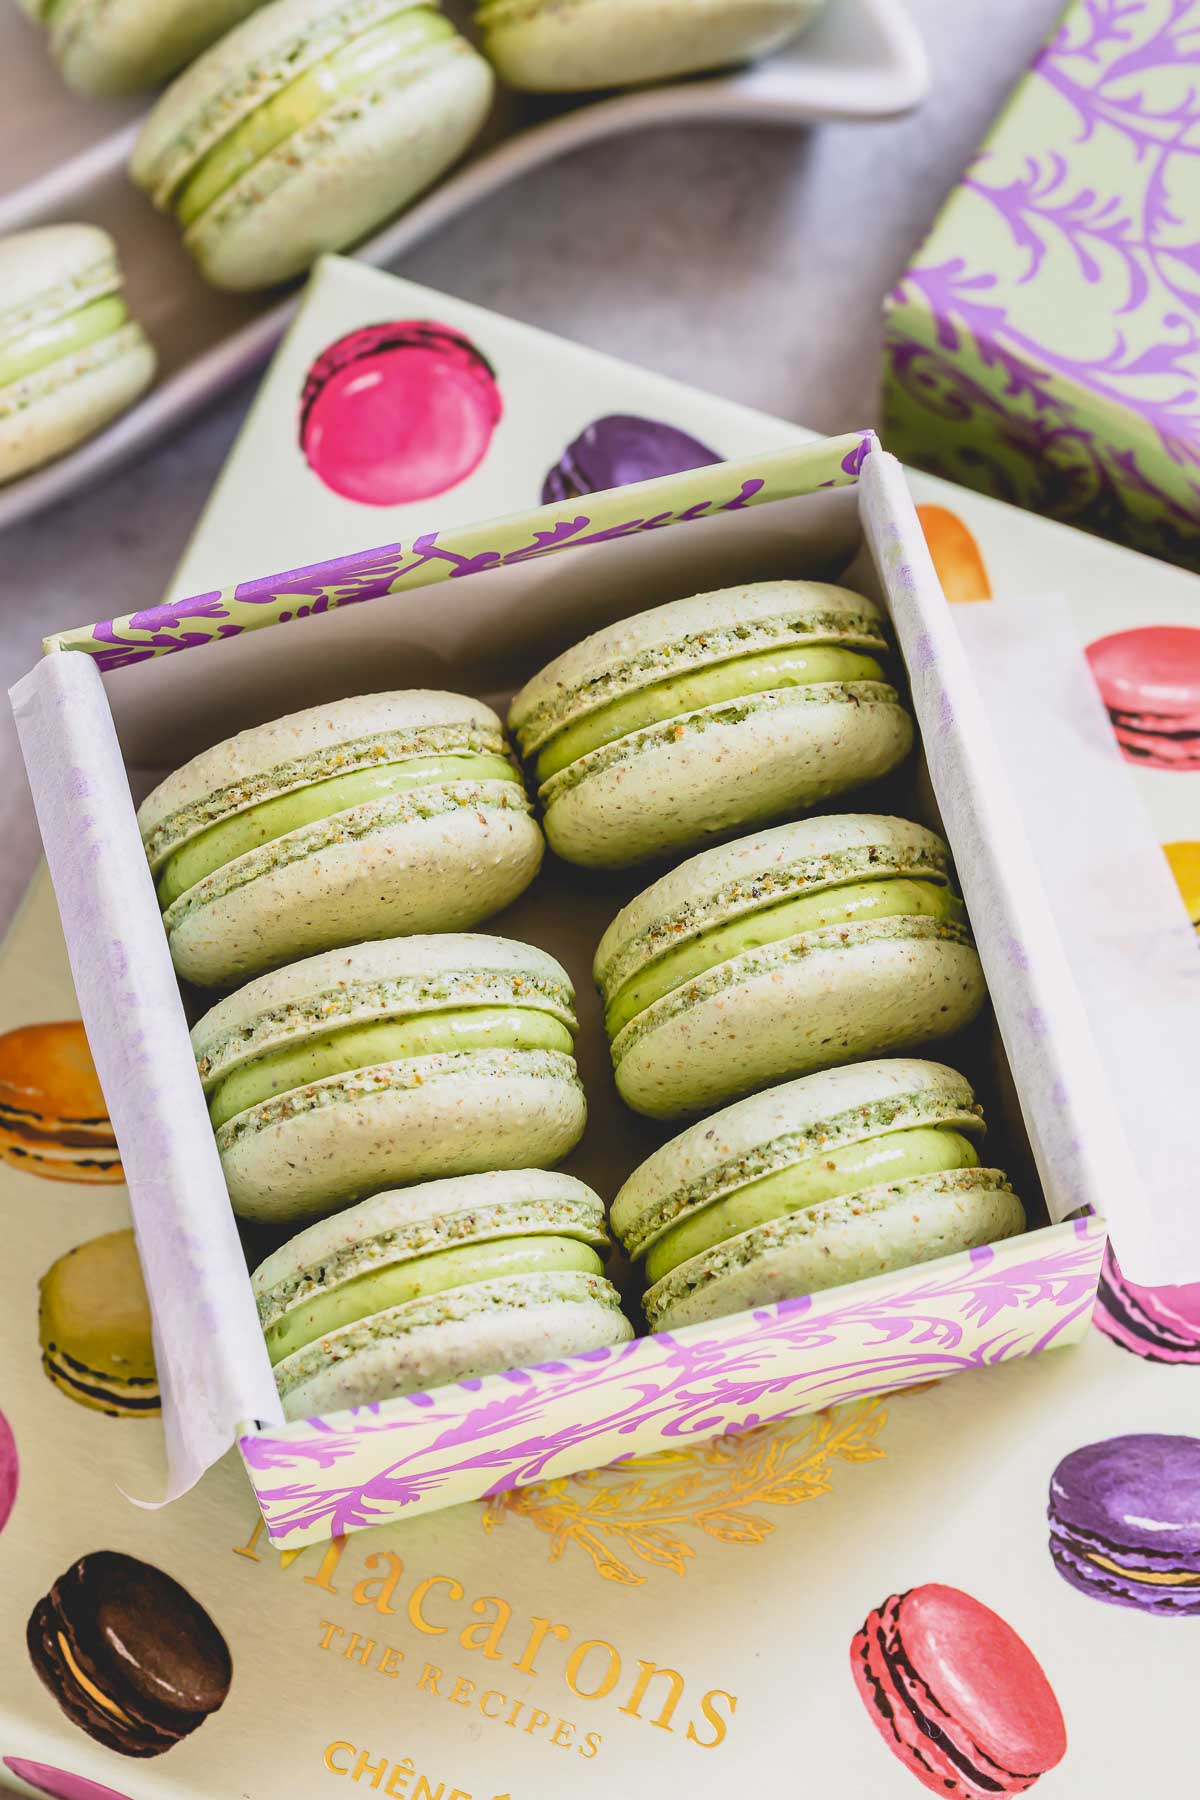 pistachio macarons in a box